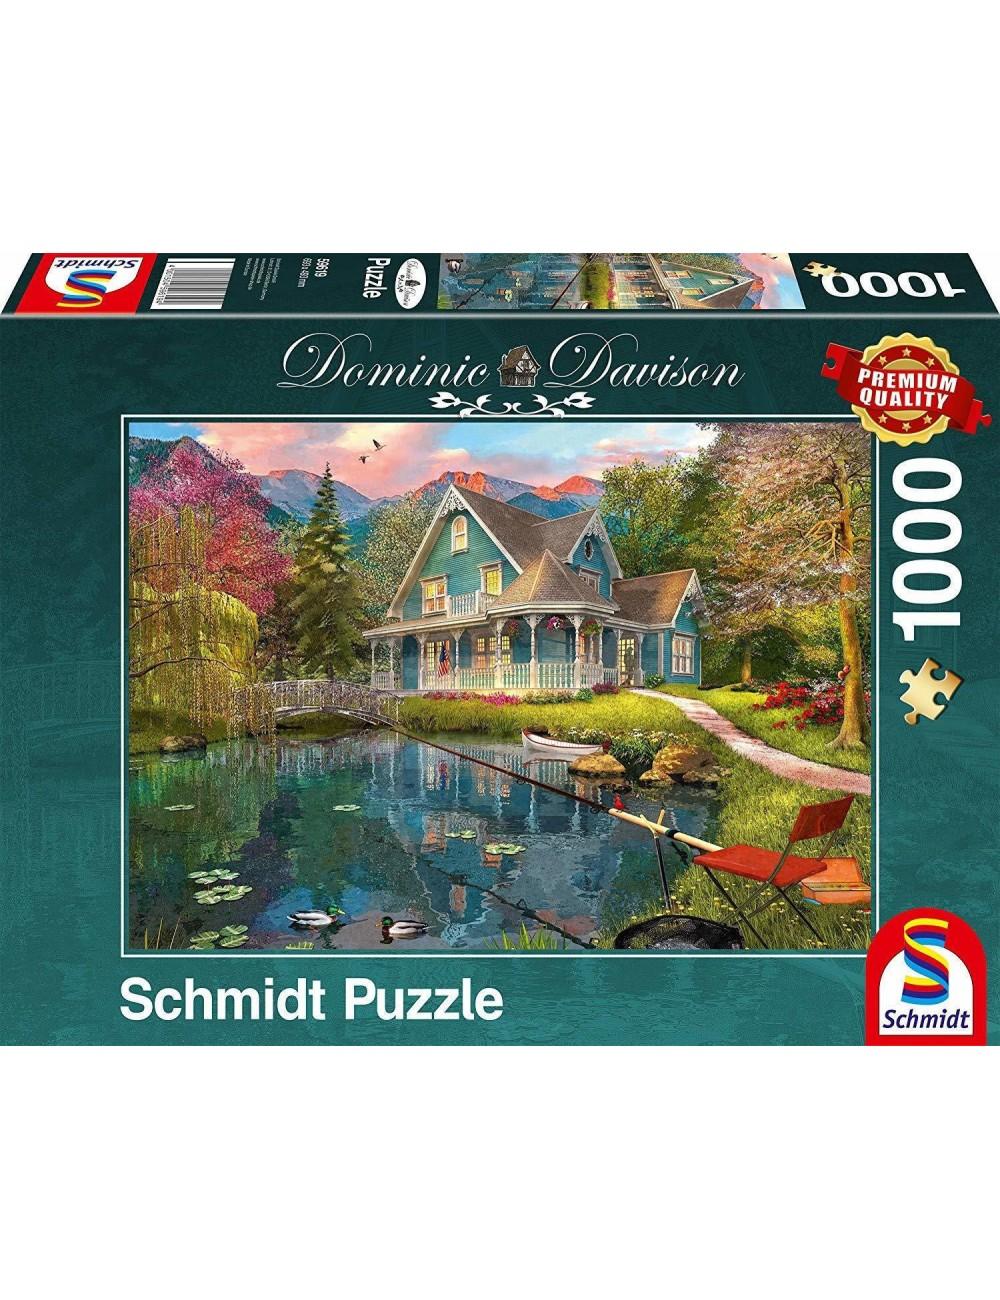 Schmidt Davison - Σπίτι δίπλα σε λίμνη  1000pcs (59619)